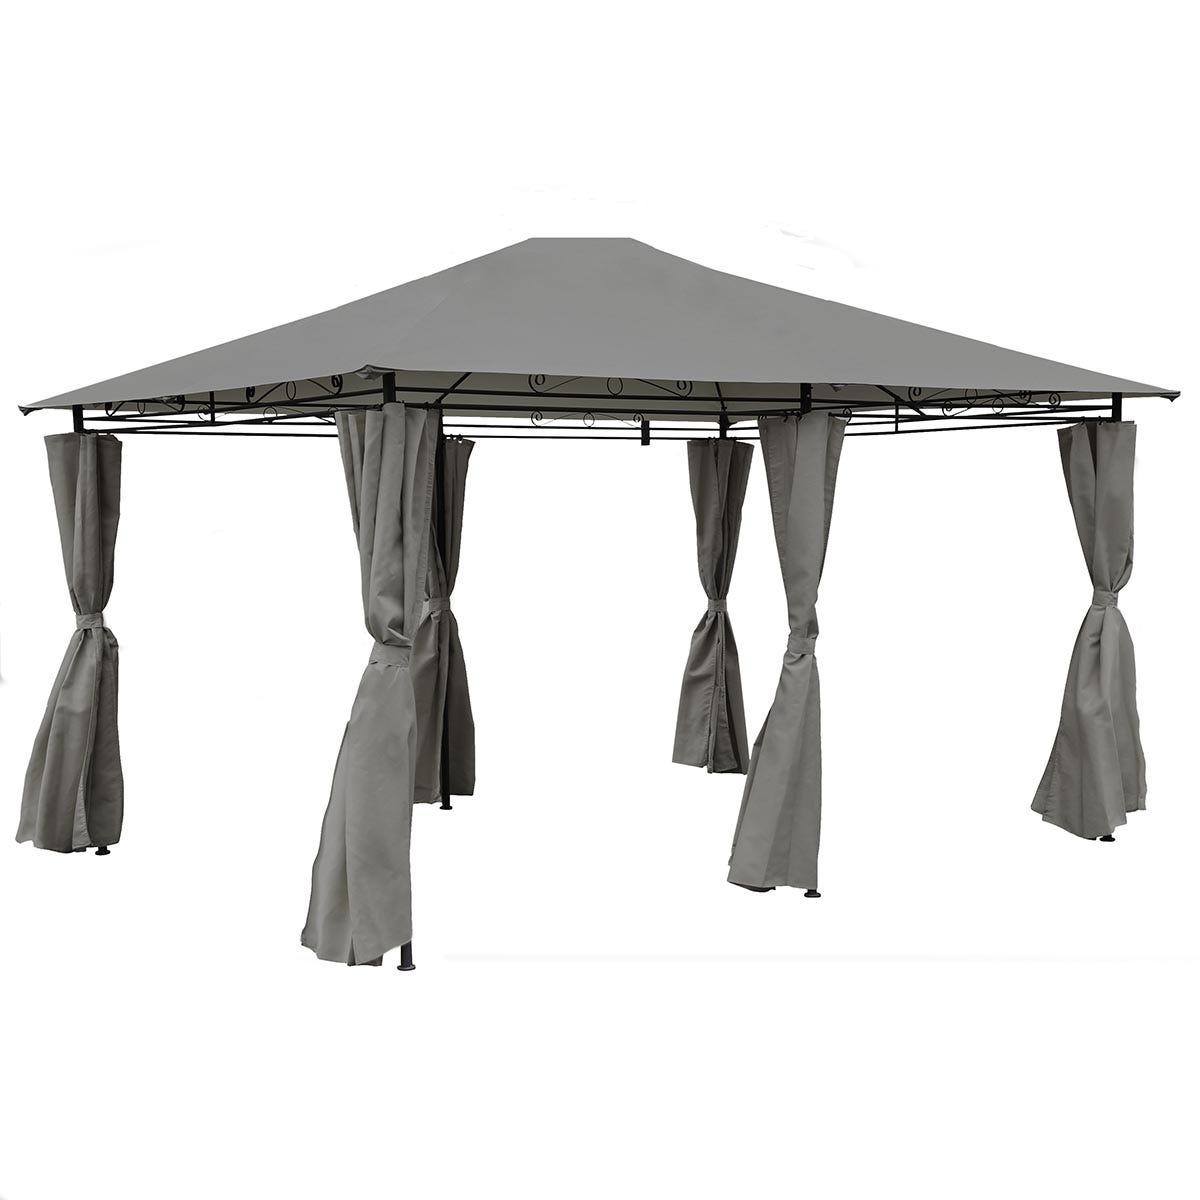 Charles Bentley 3m x 4m Steel Art Gazebo With Side Curtains - Grey